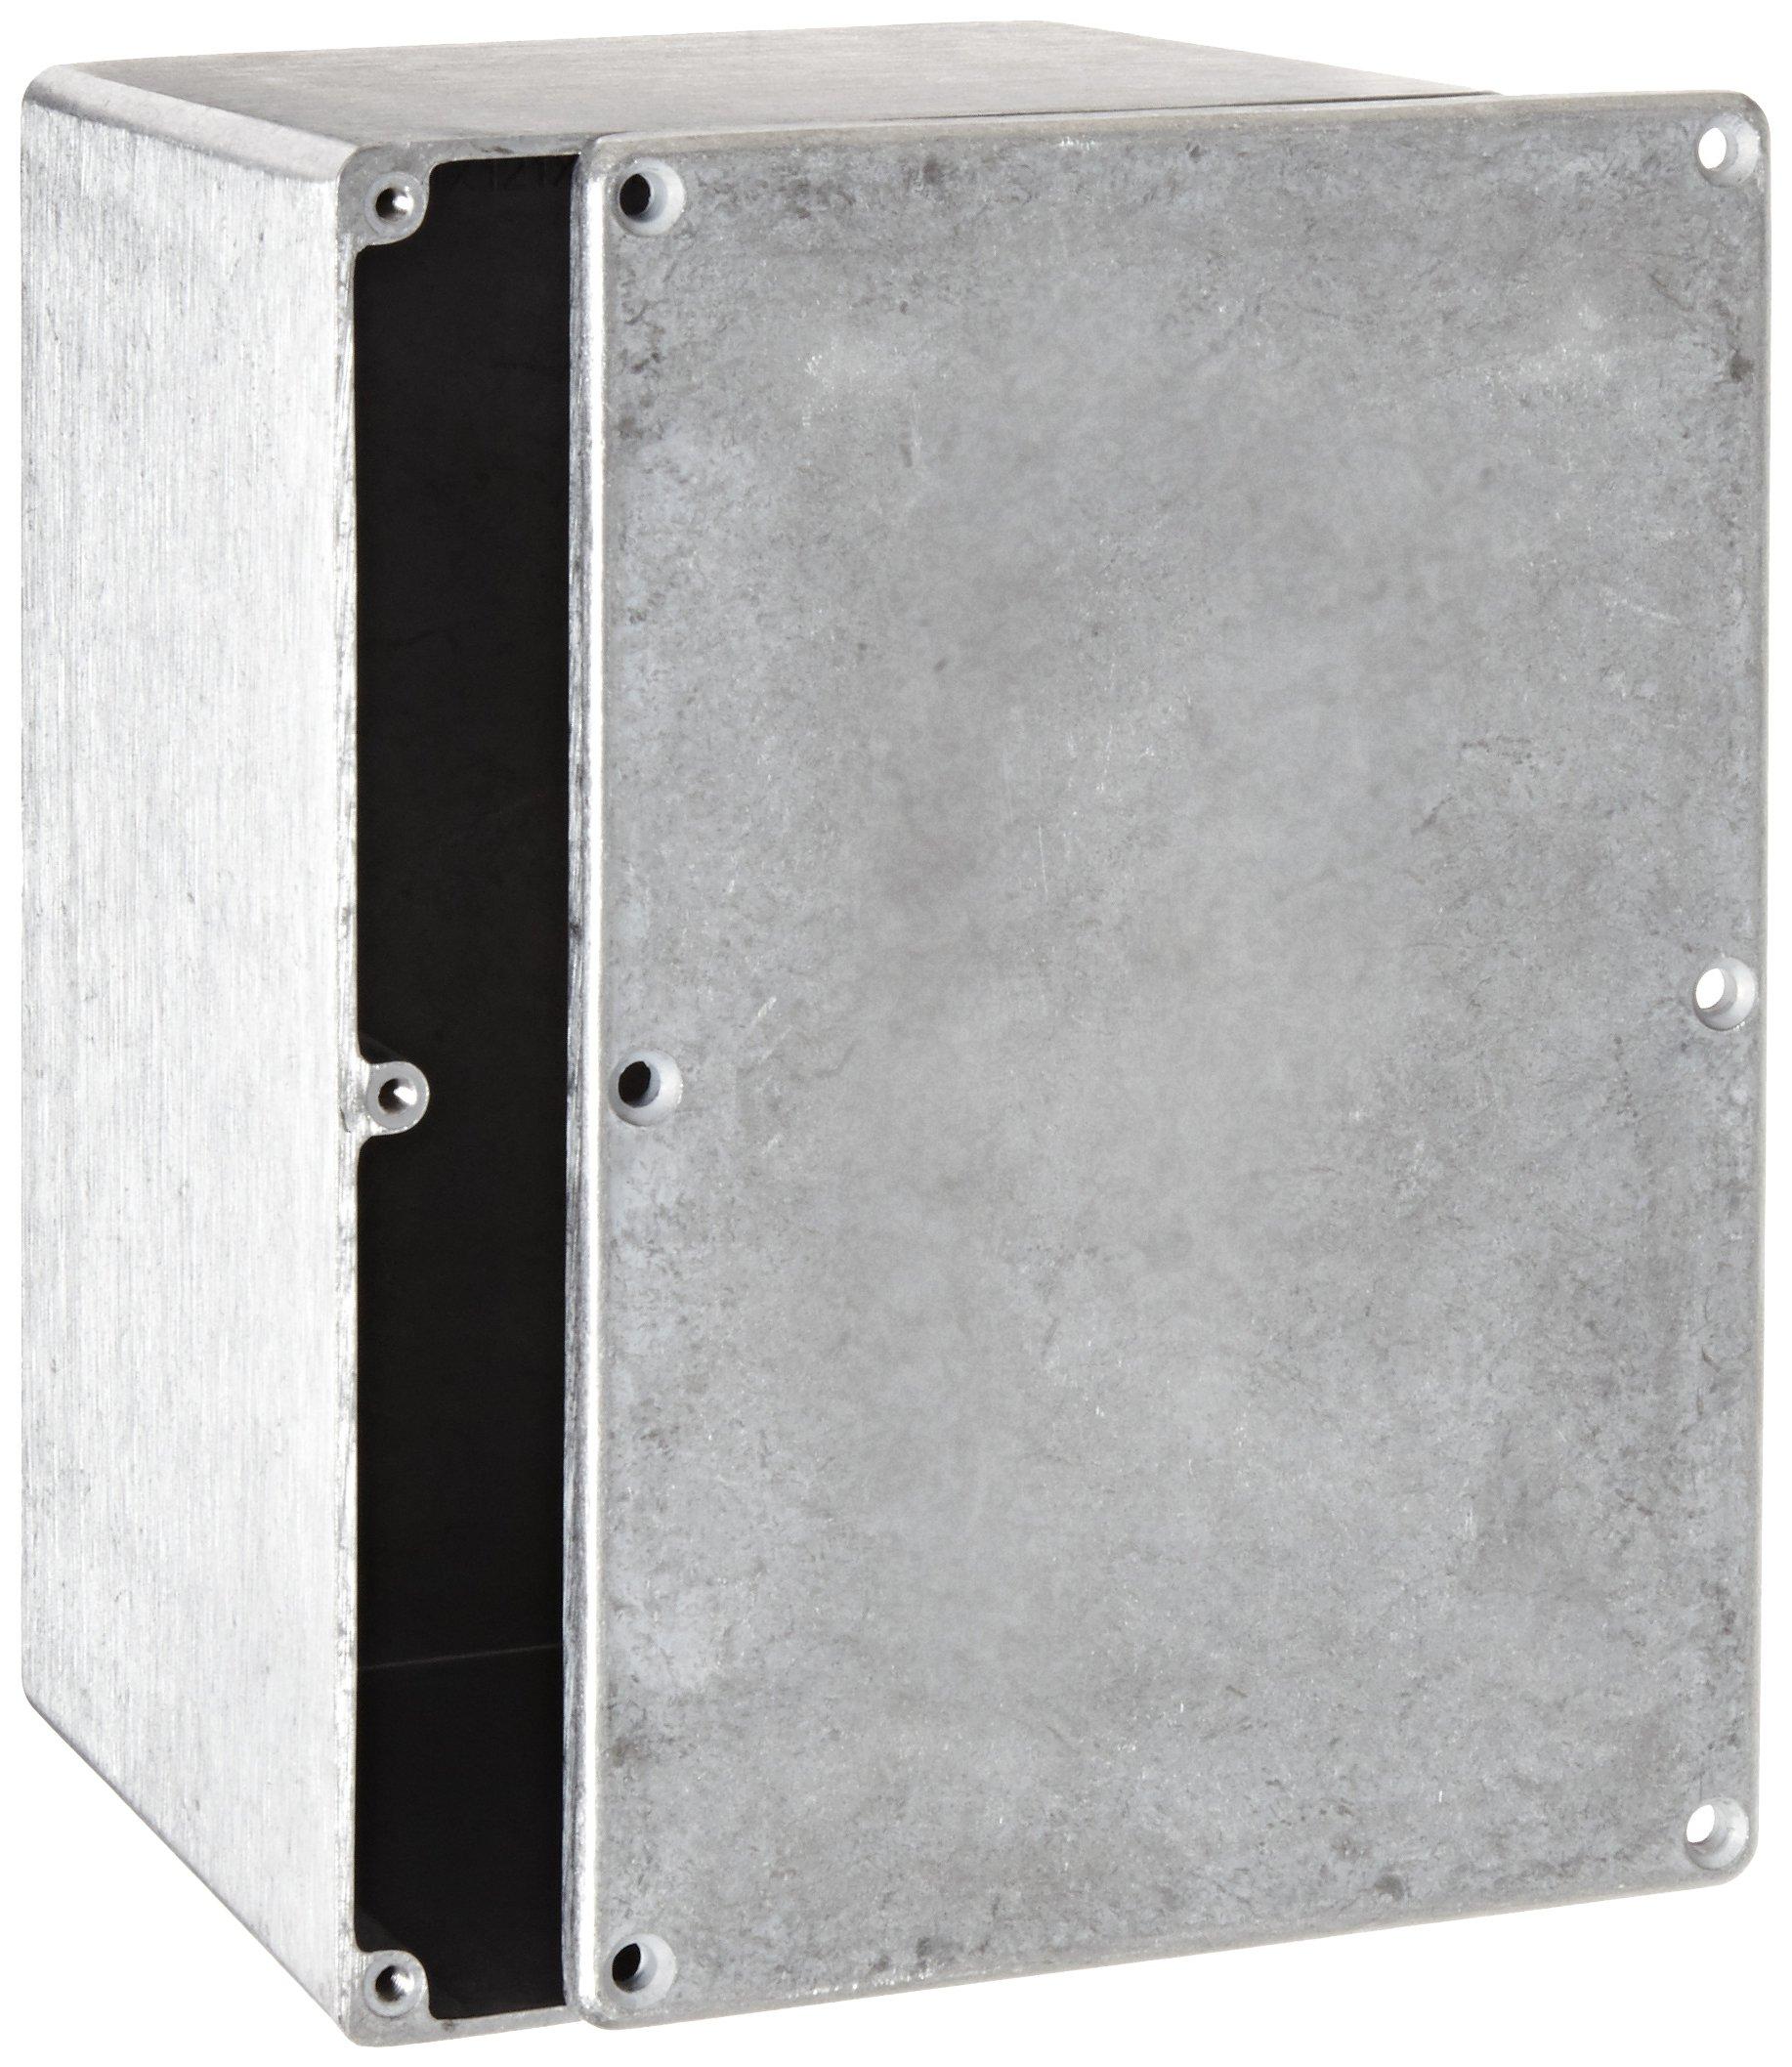 "BUD Industries CN-5710 Die Cast Aluminum Enclosure, 6-49/64"" Length x 4-49/64"" Width x 4-13/64"" Height, Natural Finish"